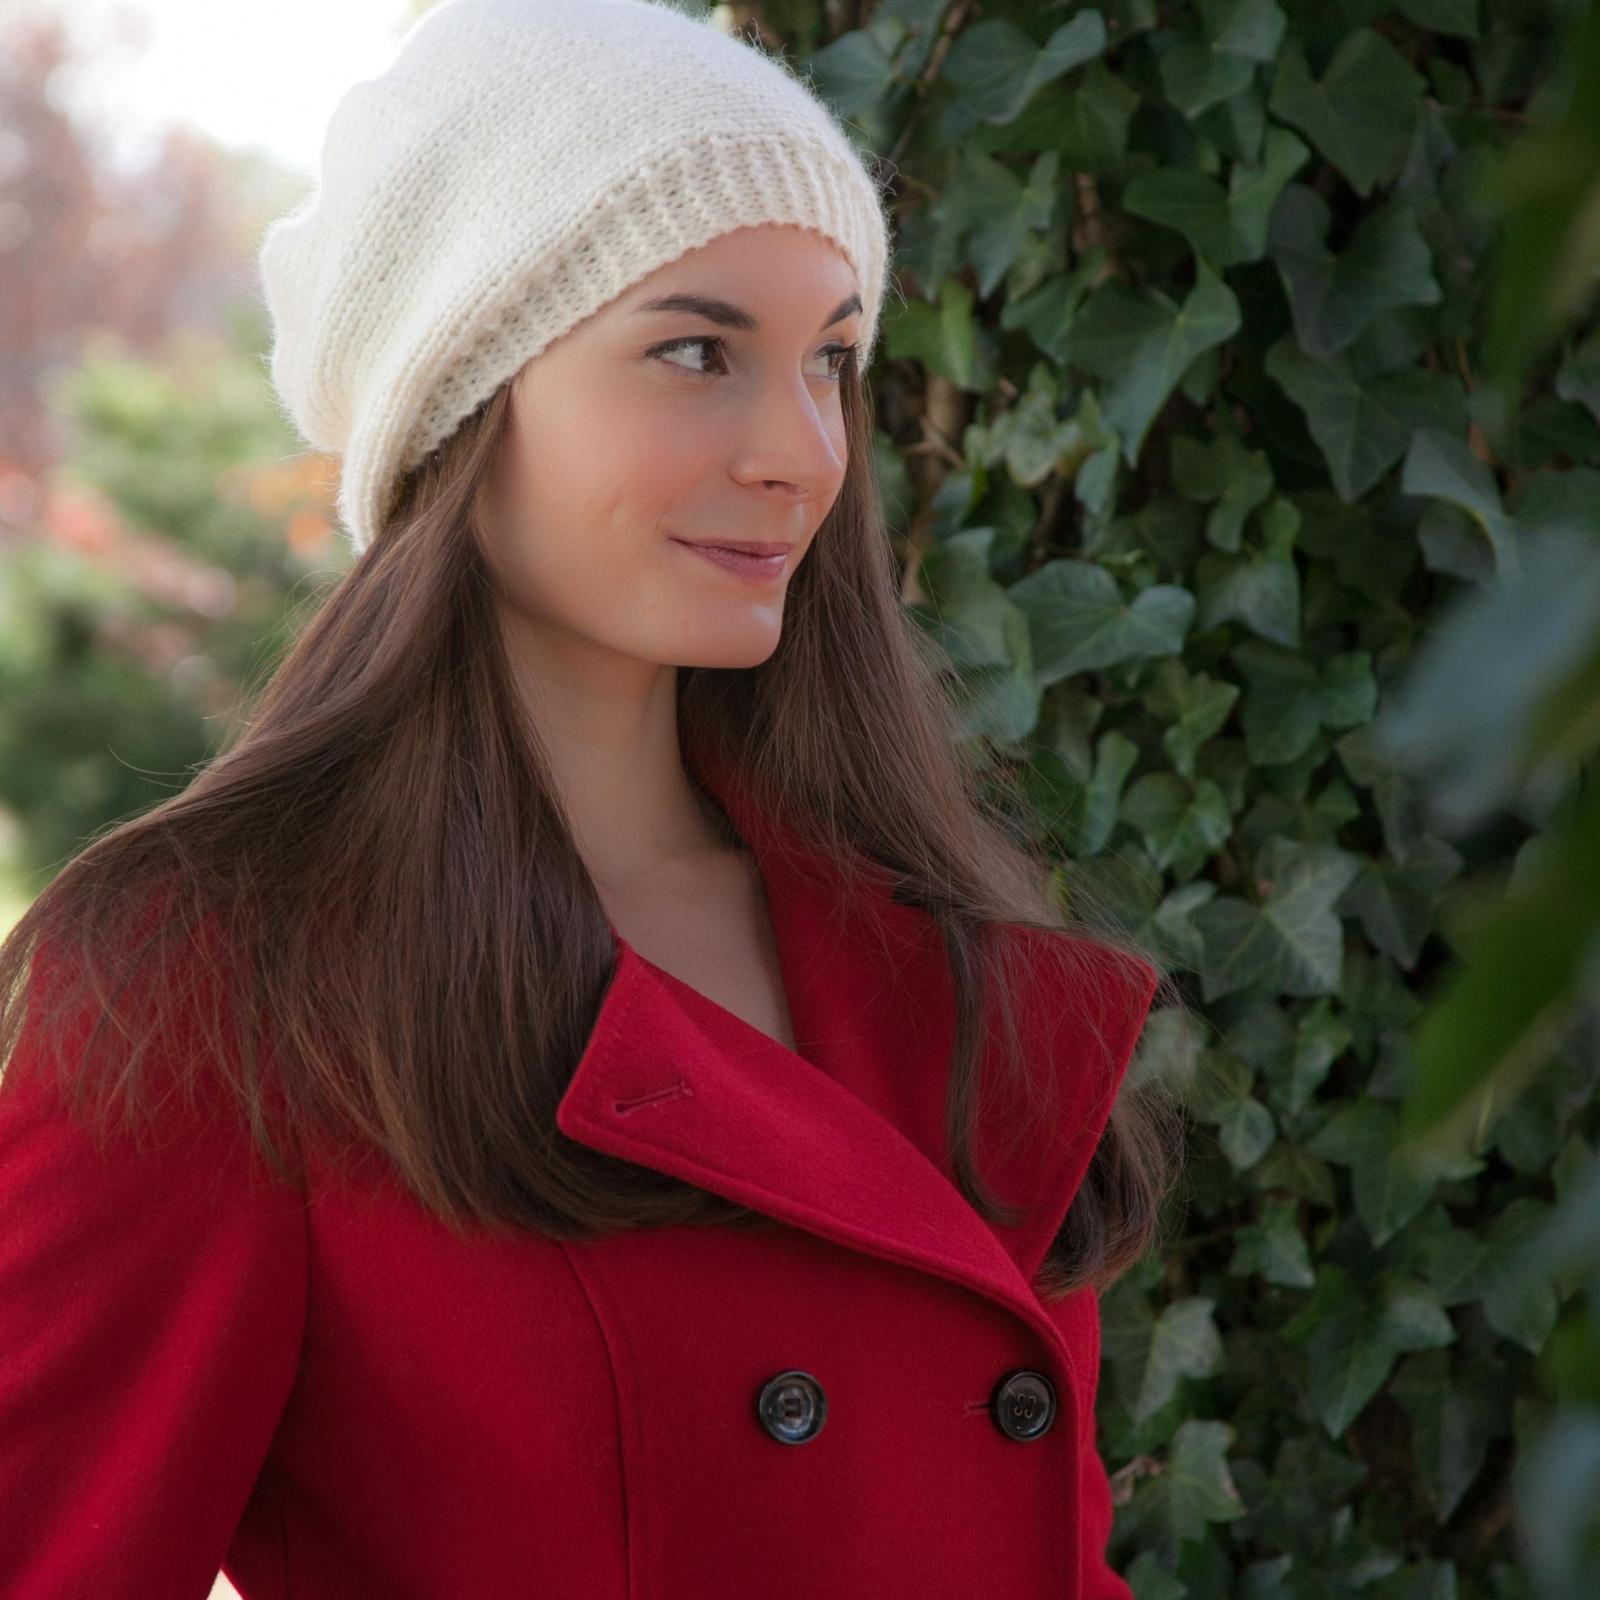 Loom Knit Beret Pattern Winter Trendy Hat Tam 3 Sizes This